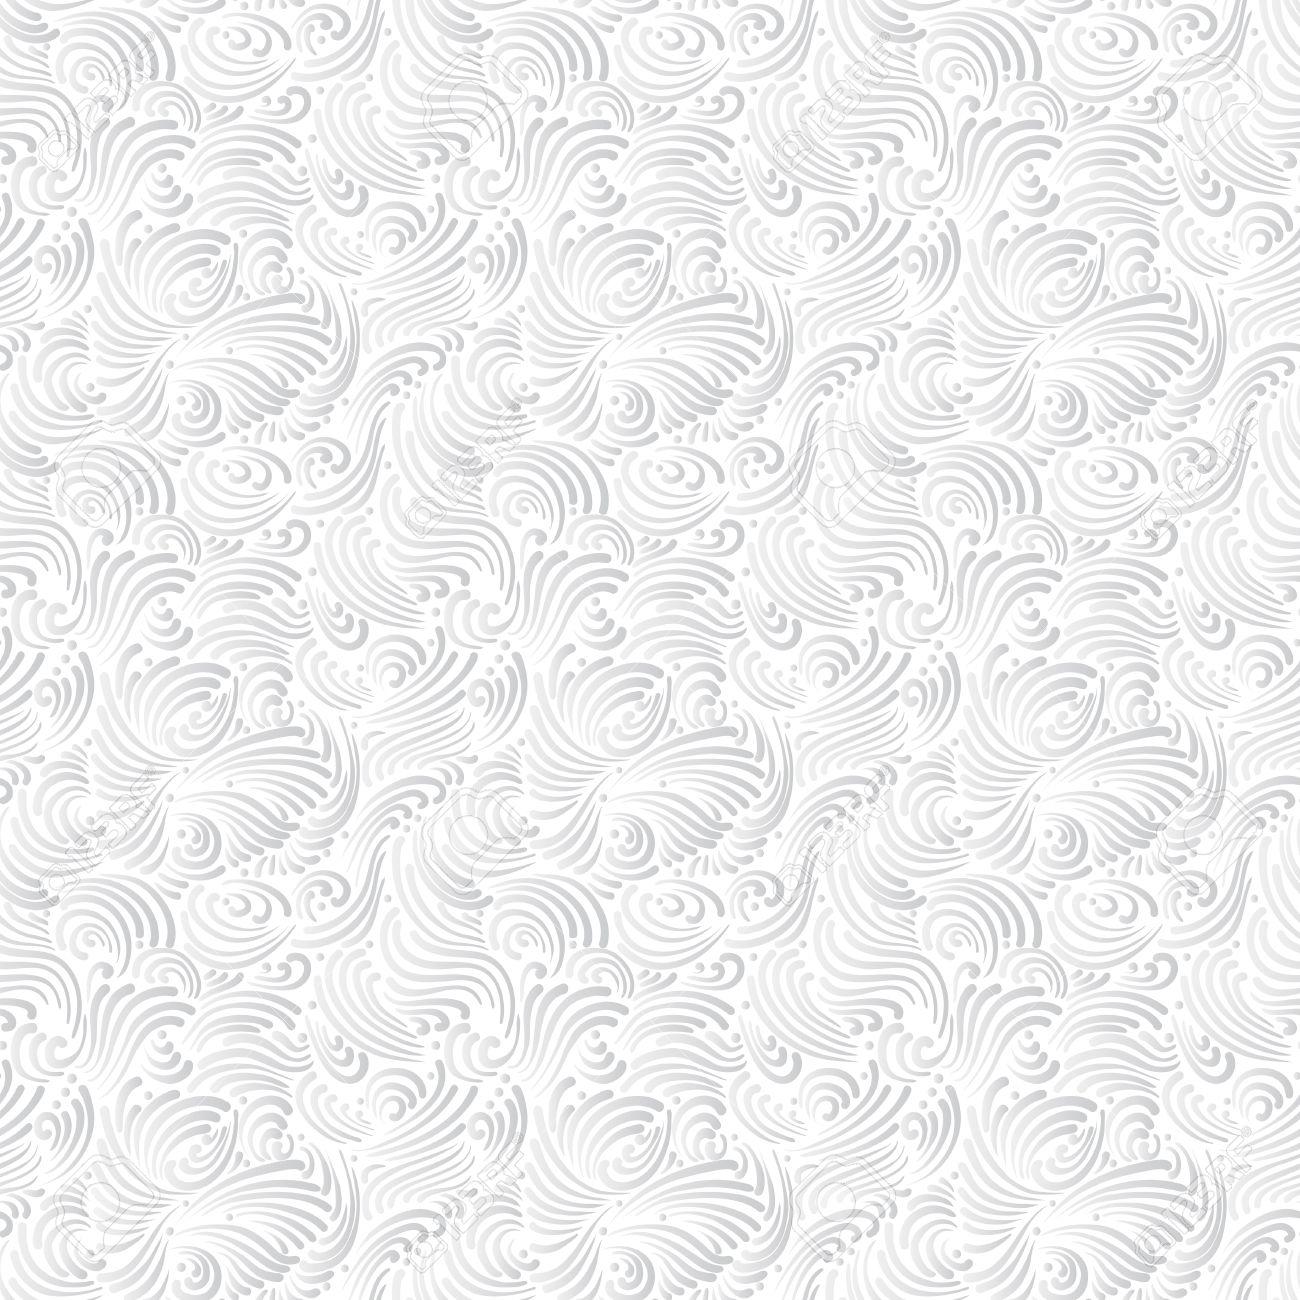 Resultado de imagen para white background pattern